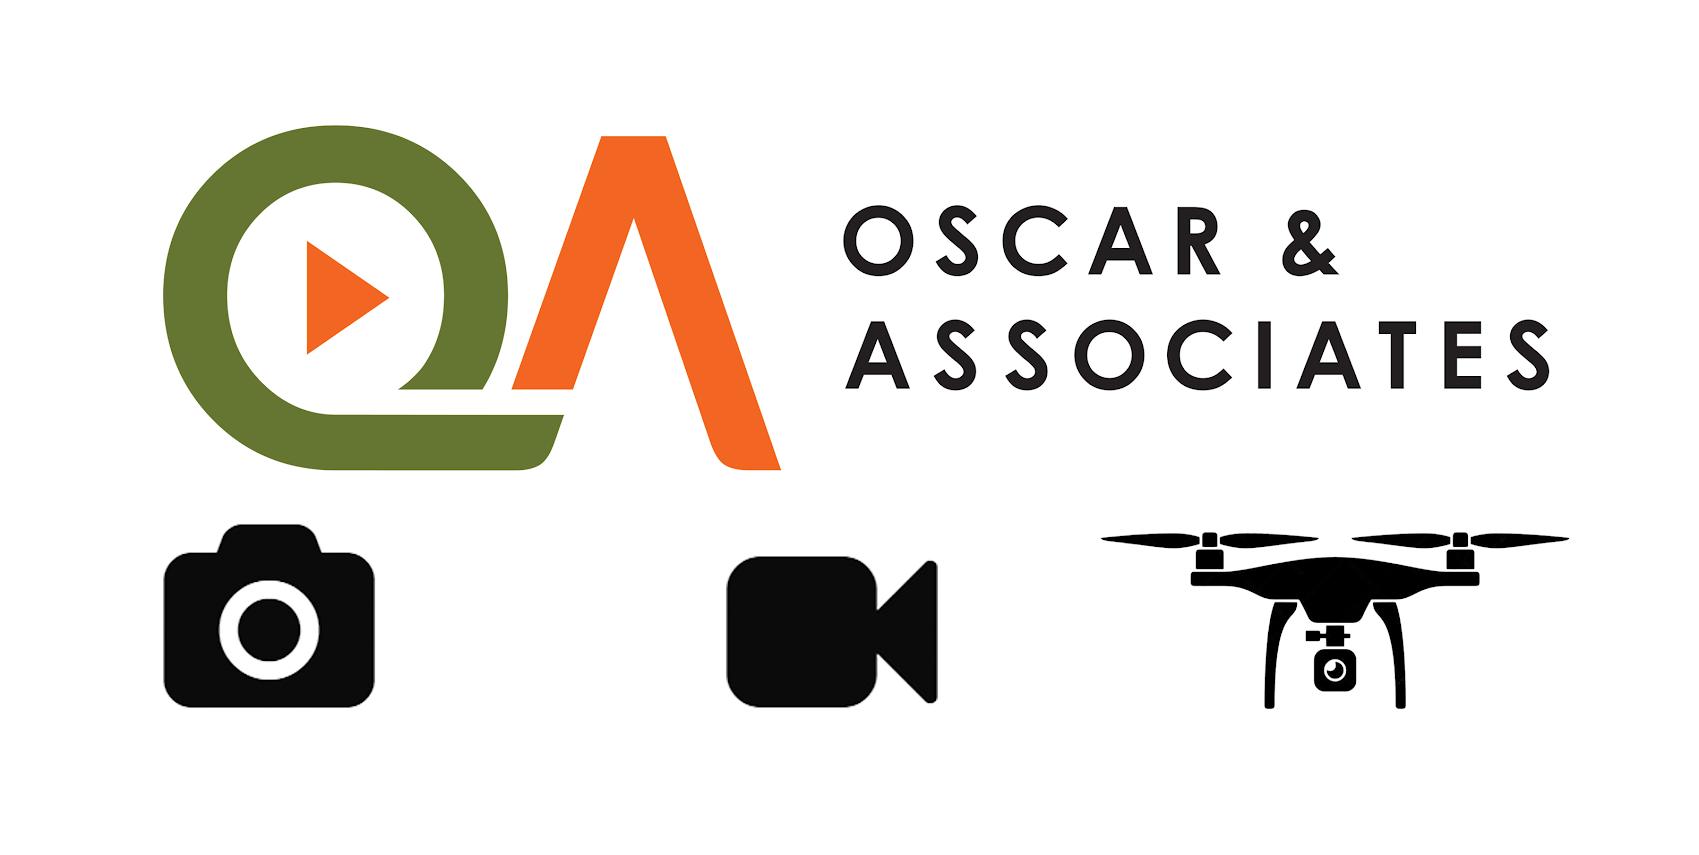 OscarAndAssociates.png